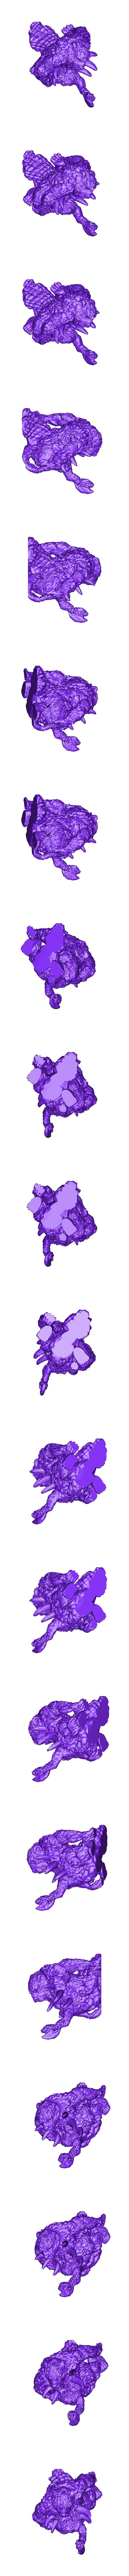 Zombeaver_Abomination.stl Download STL file Beavermancer Set • Object to 3D print, PorcSkulpt9